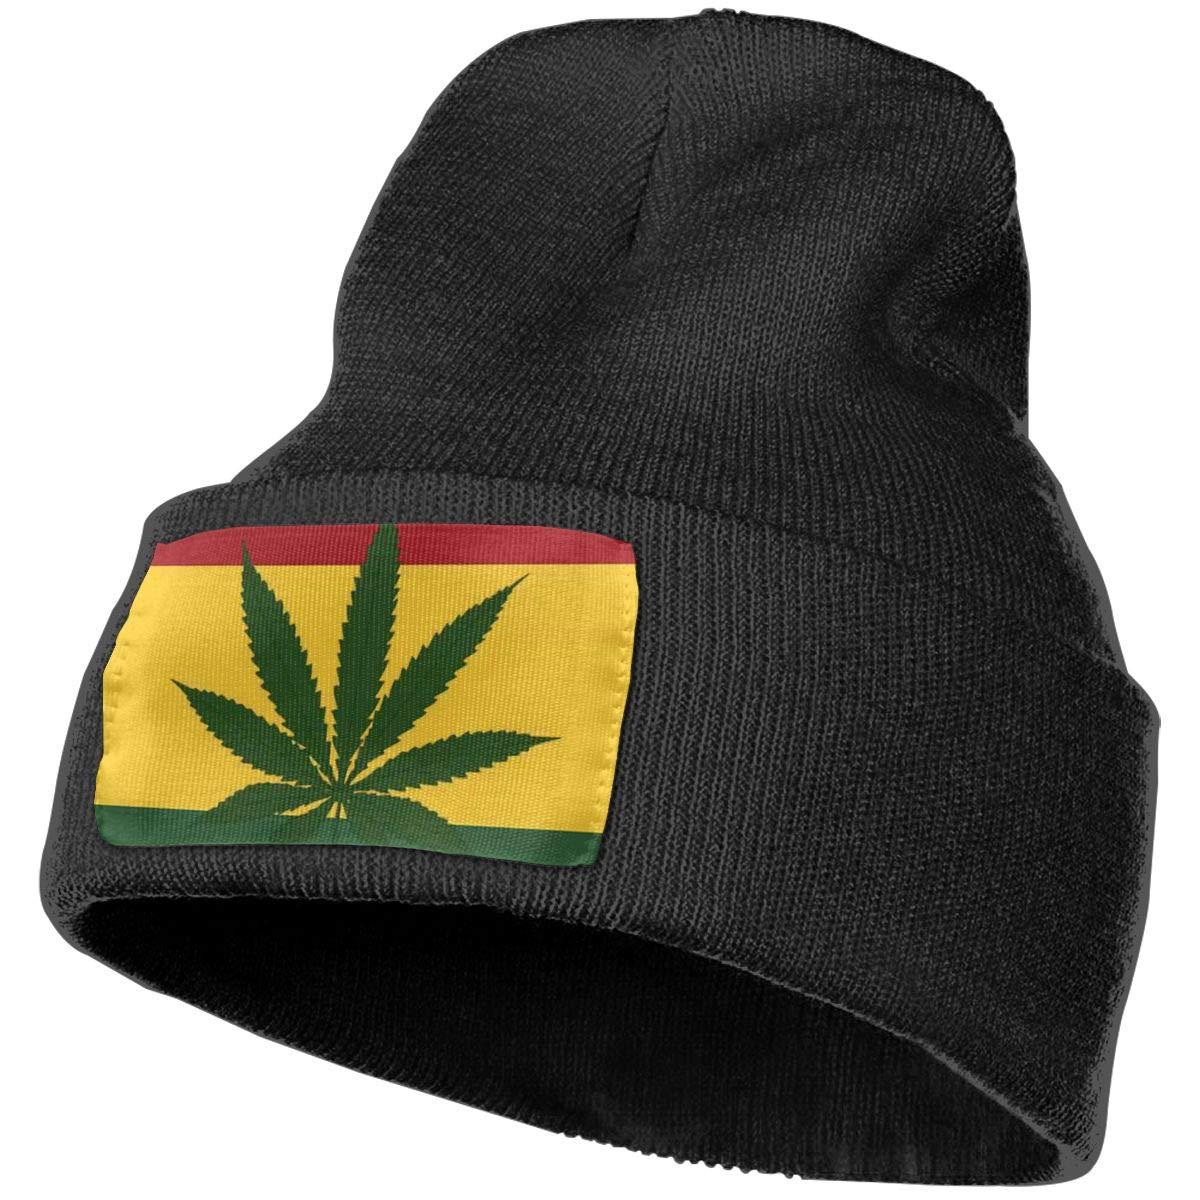 Horizon-t Shark Unisex 100/% Acrylic Knitting Hat Cap Fashion Beanie Hat